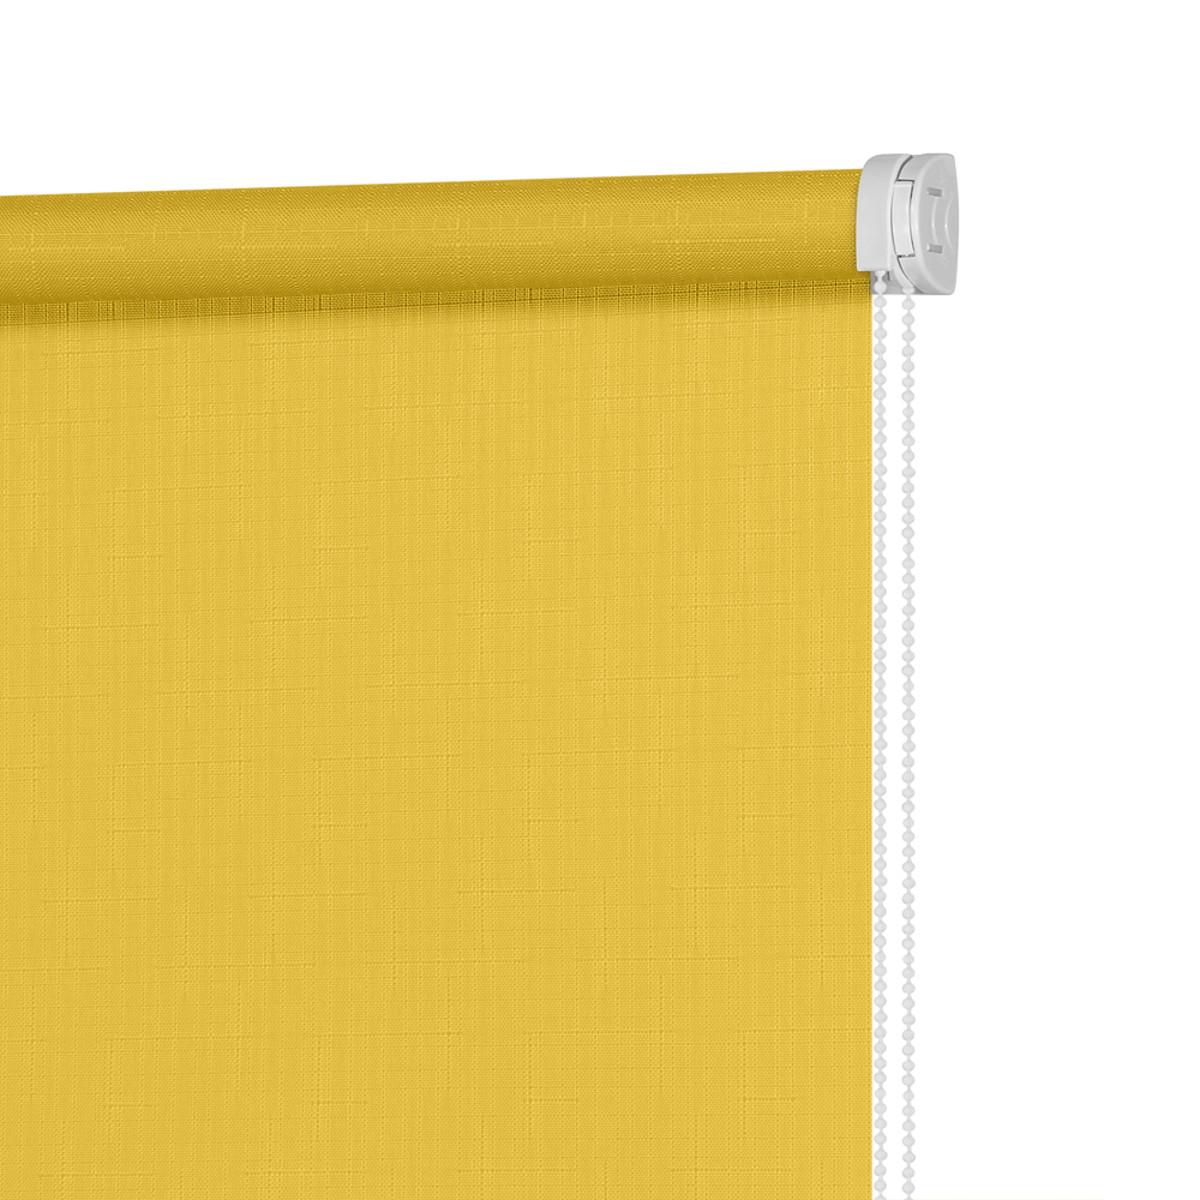 Рулонная Ора Decofest Апилера 90Х160 Цвет Желтый